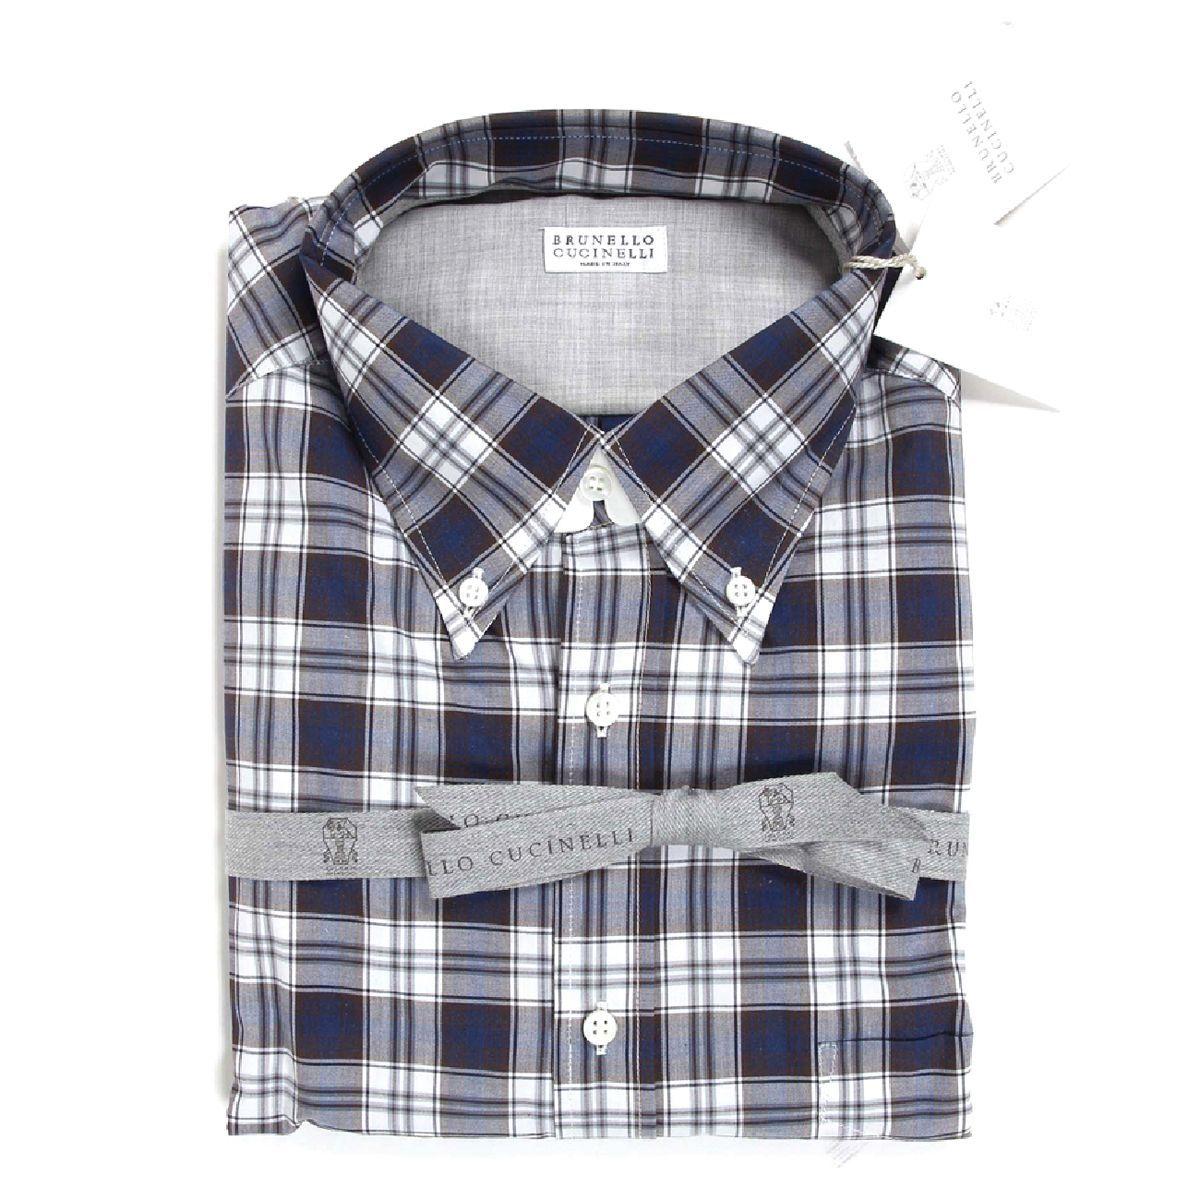 Brunello Cucinelli Mens Shirt MA6550068 C928